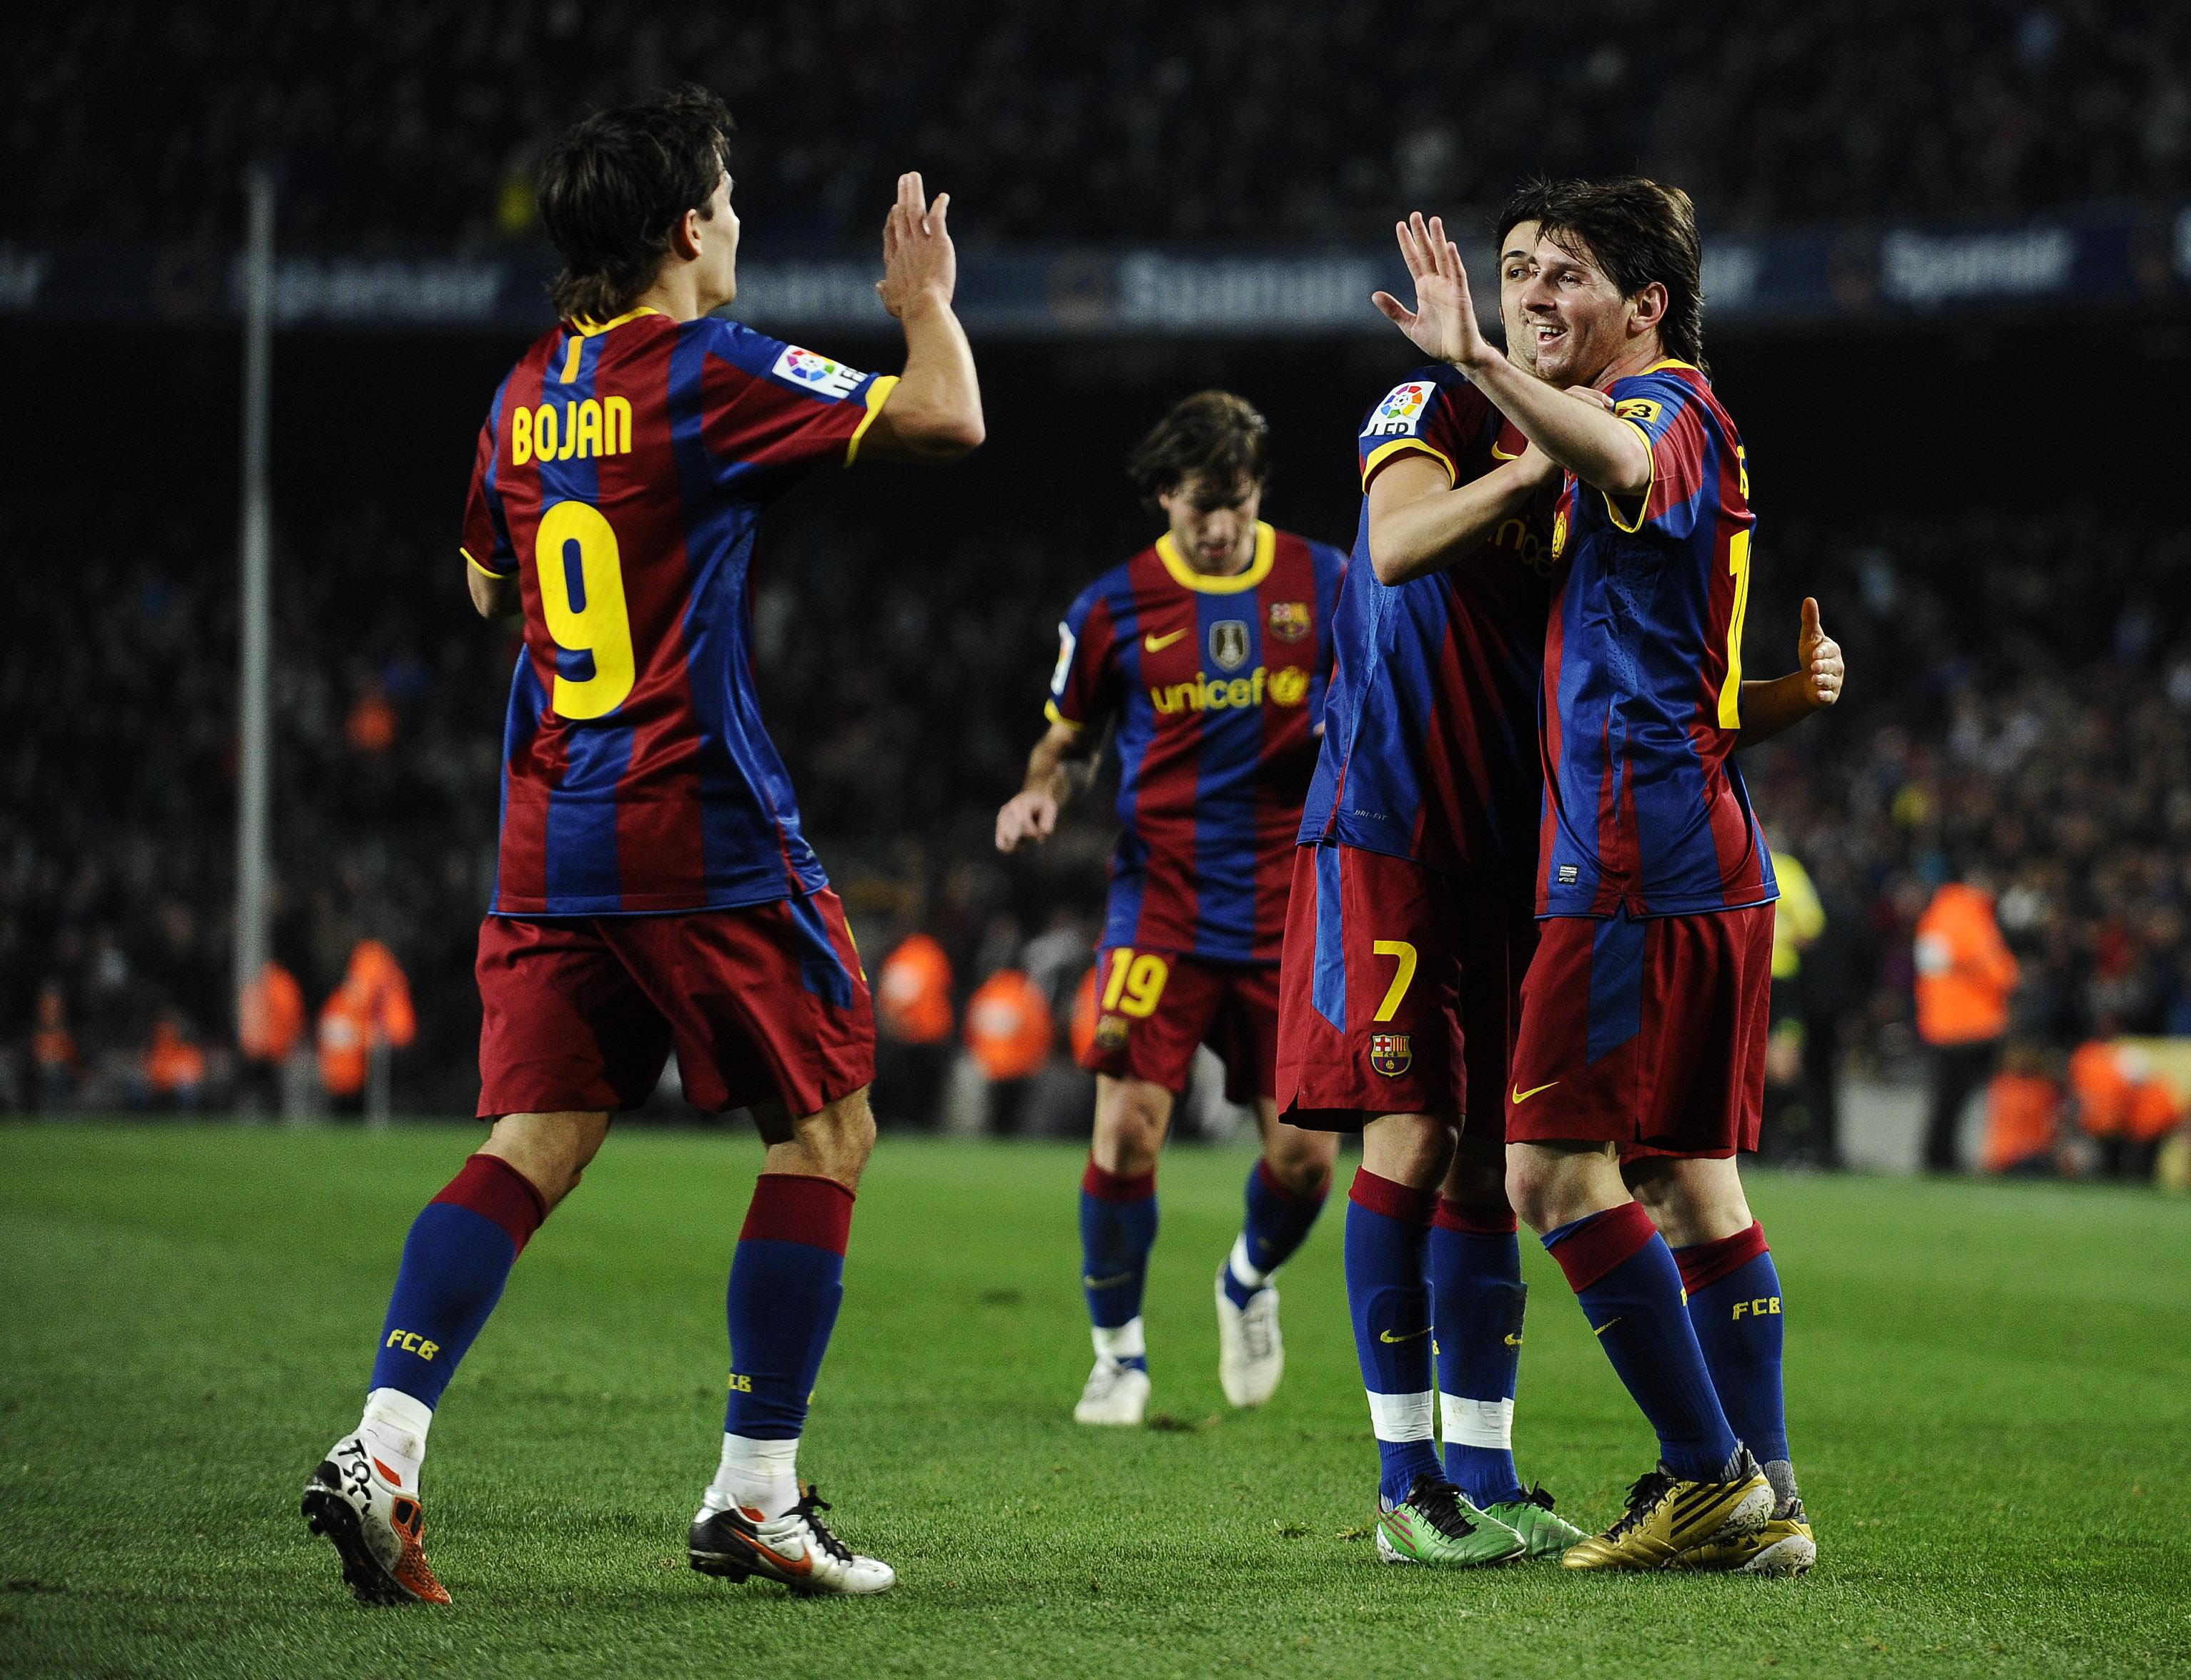 BARCELONA, SPAIN - DECEMBER 12:  Lionel Messi of Barcelona (R), David Villa (2ndR) and Bojan Krkic celebrate after Lionel Messi scored his second goal during the La Liga match between Barcelona and Real Sociedad at Camp Nou Stadium on December 12, 2010 in